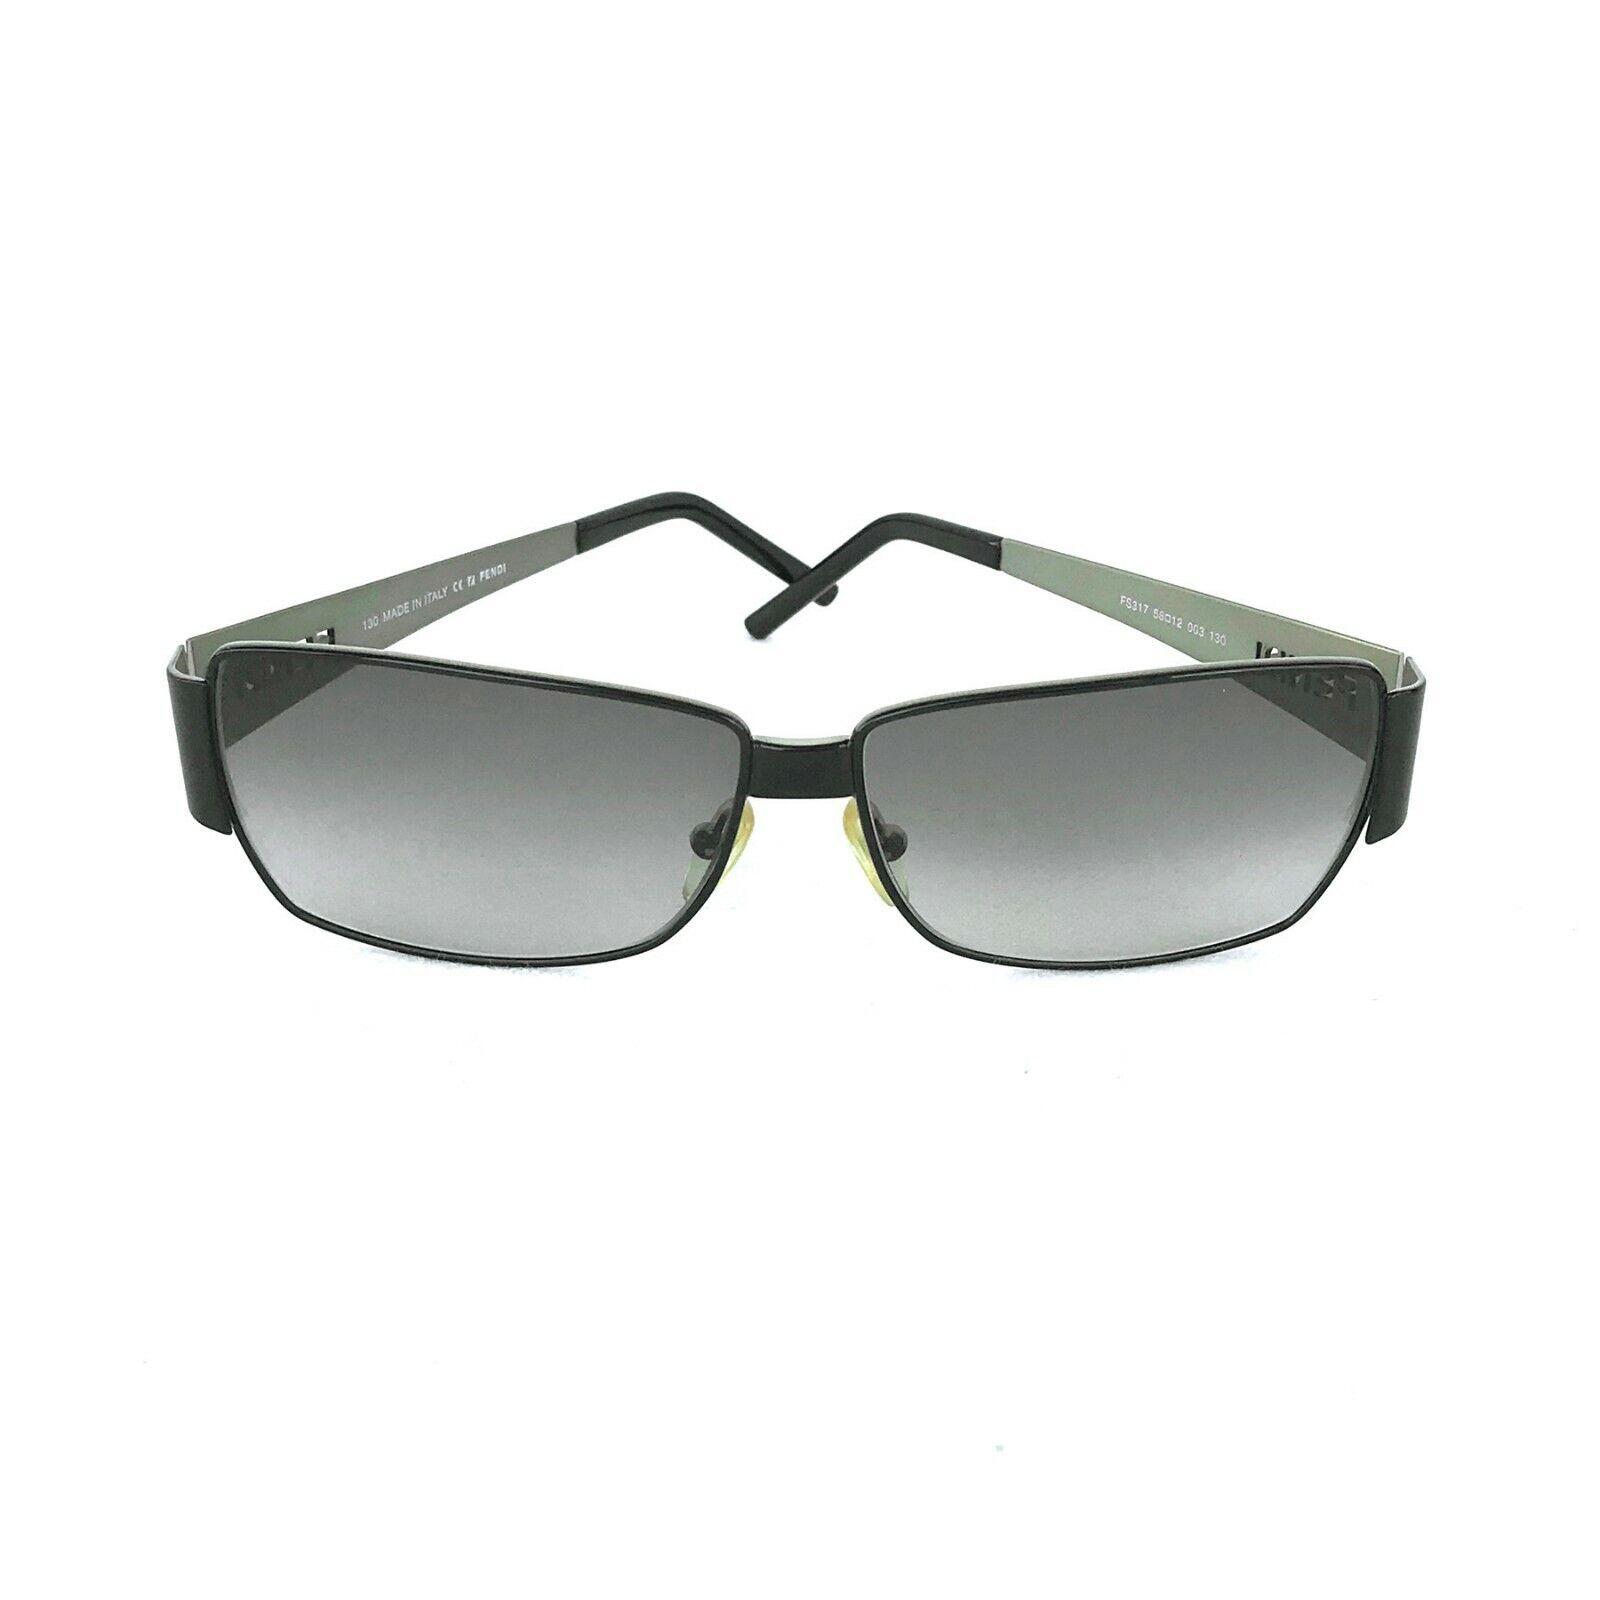 FENDI Black Rimmed Sunglasses FS317 Made in Italy Great Condition